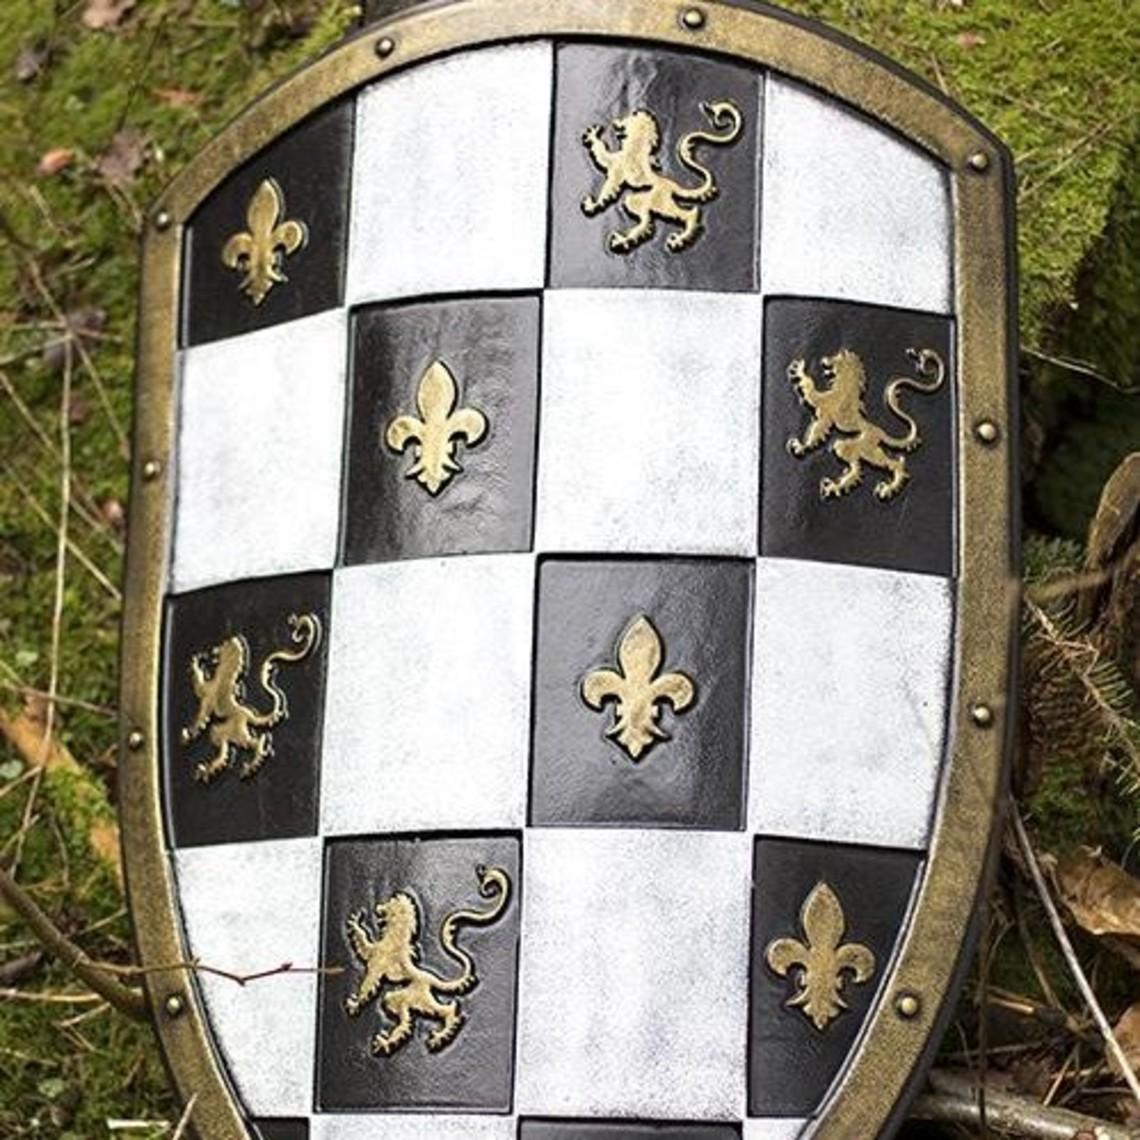 Epic Armoury LARP cuadros Escudo blanco / negro / oro